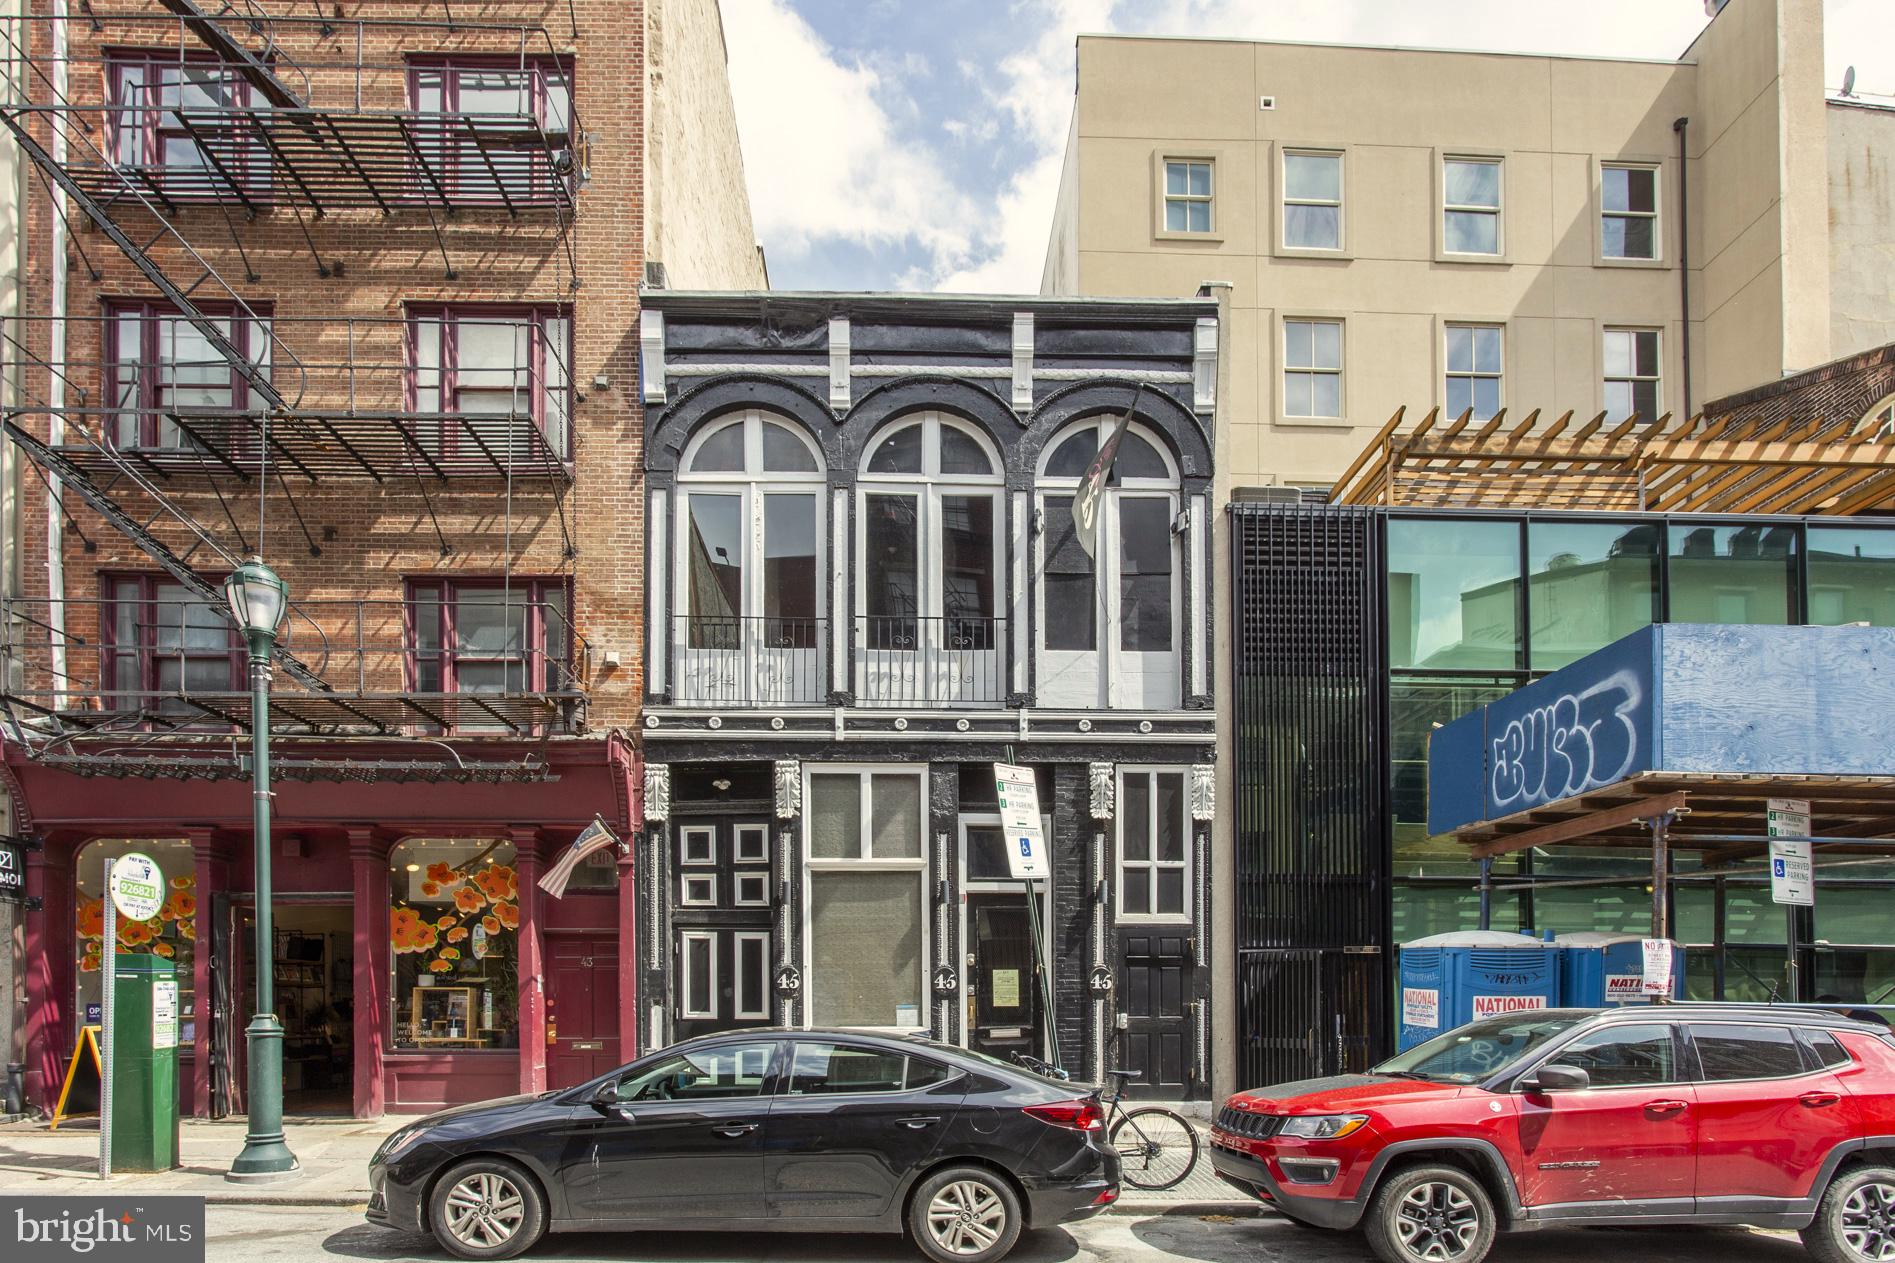 45 S 3RD St, Philadelphia, PA, 19106